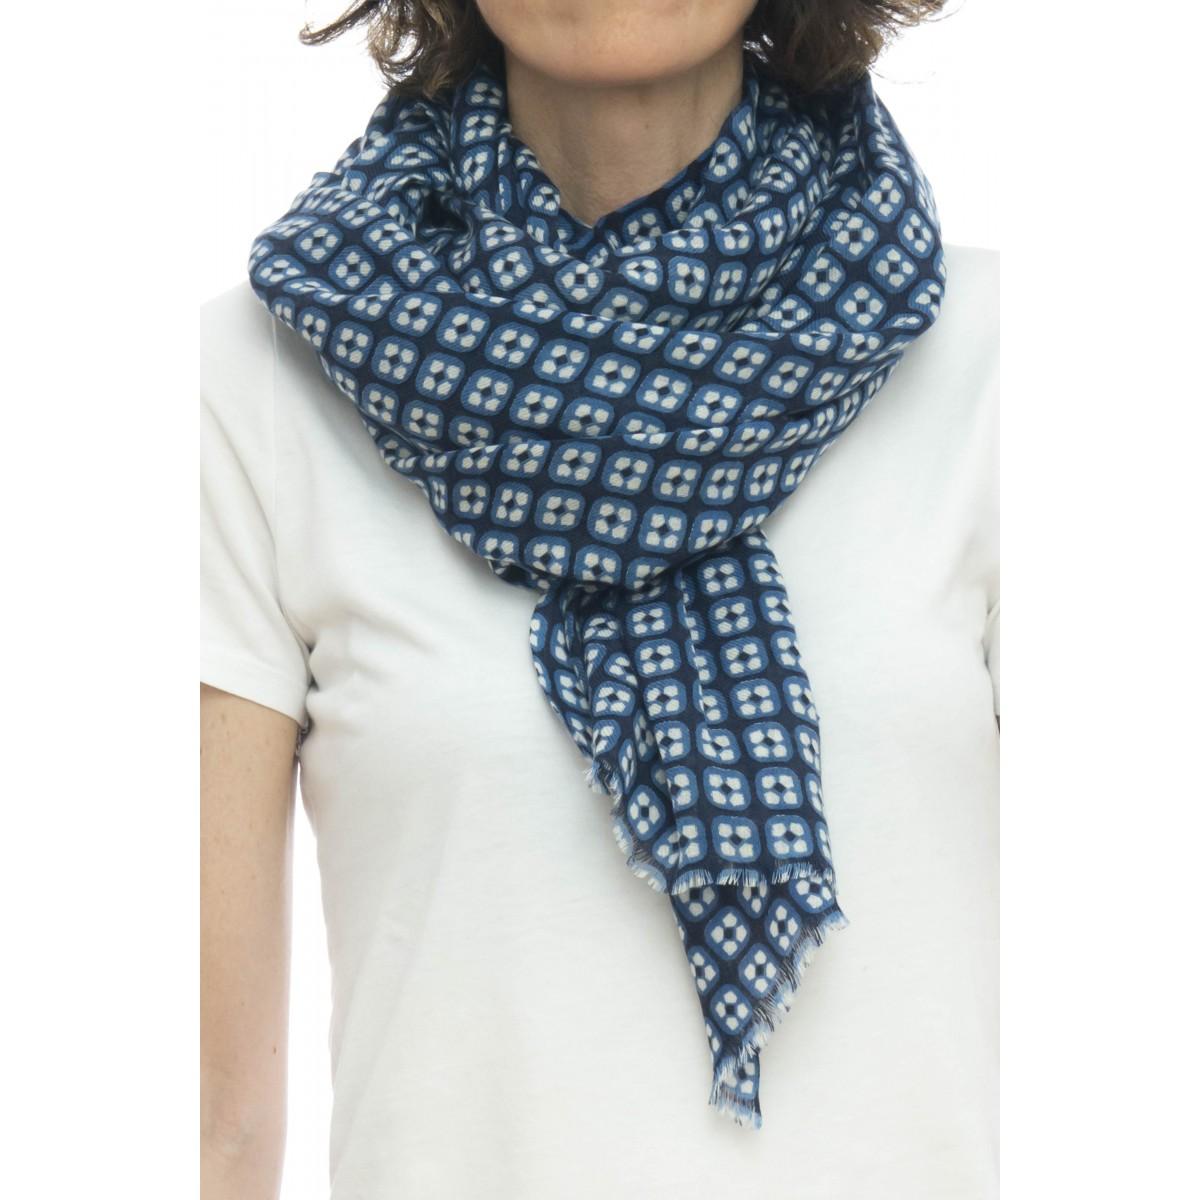 Sciarpa - Margherita 4518  100% lana, 70 x 200